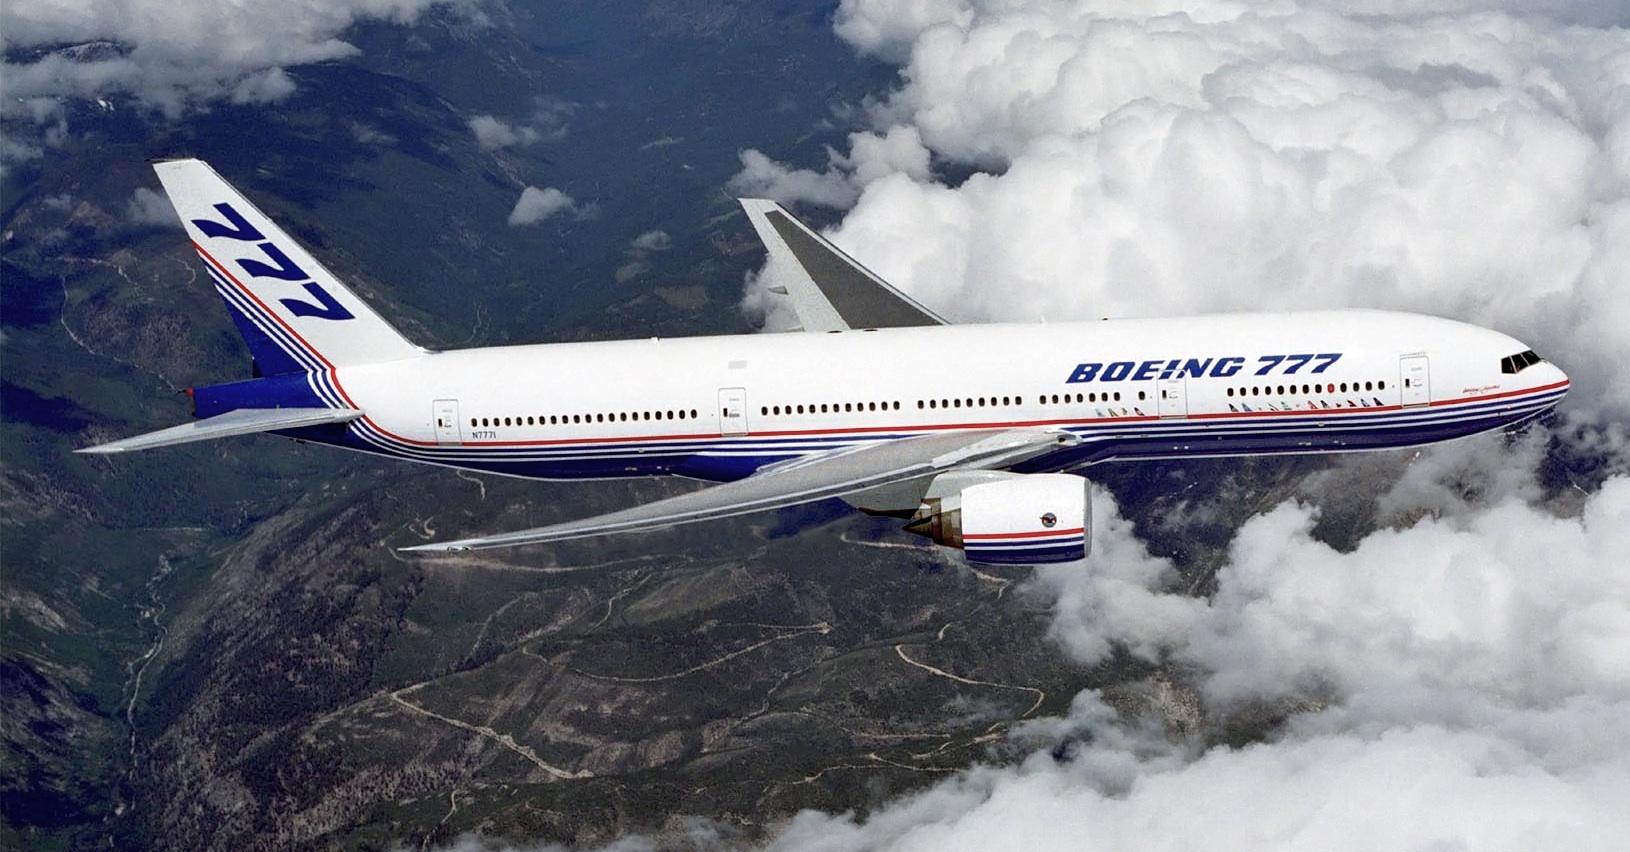 Ini 10 pesawat penumpang terbesar dunia, di Indonesia juga ada